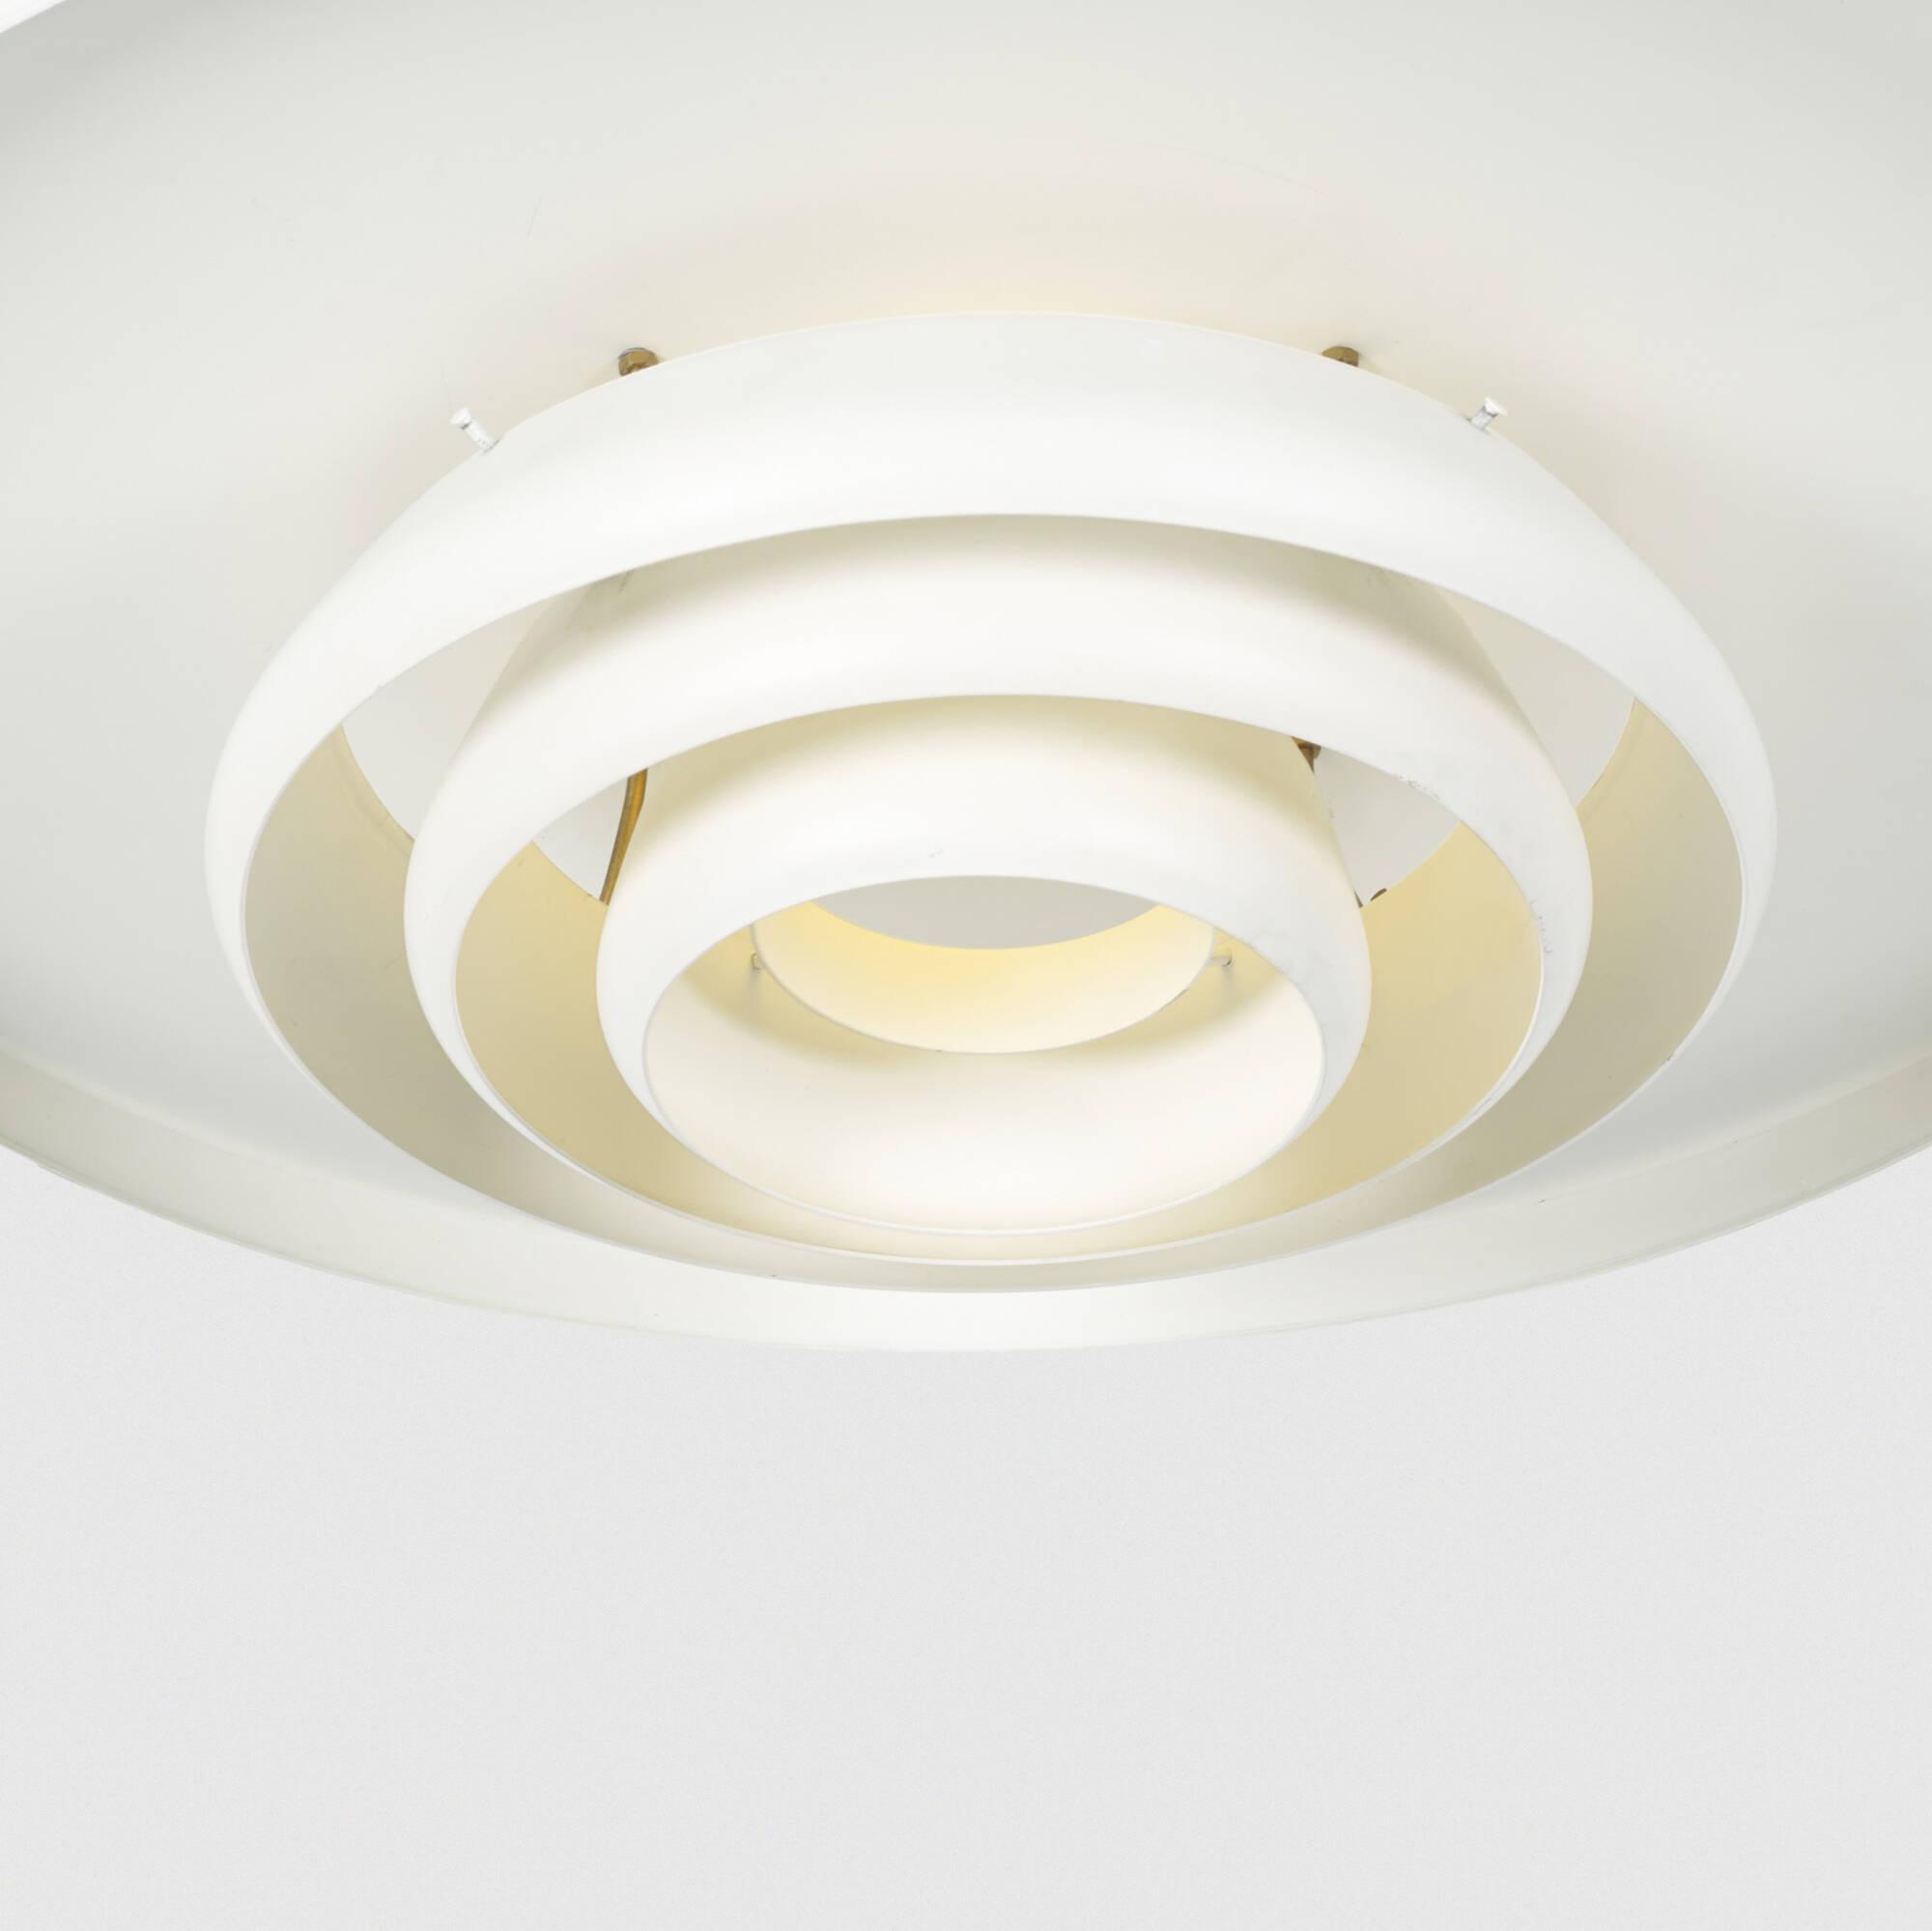 181 alvar aalto flying saucer ceiling lamp model a337 181 alvar aalto flying saucer ceiling lamp model a337 2 of 2 arubaitofo Images